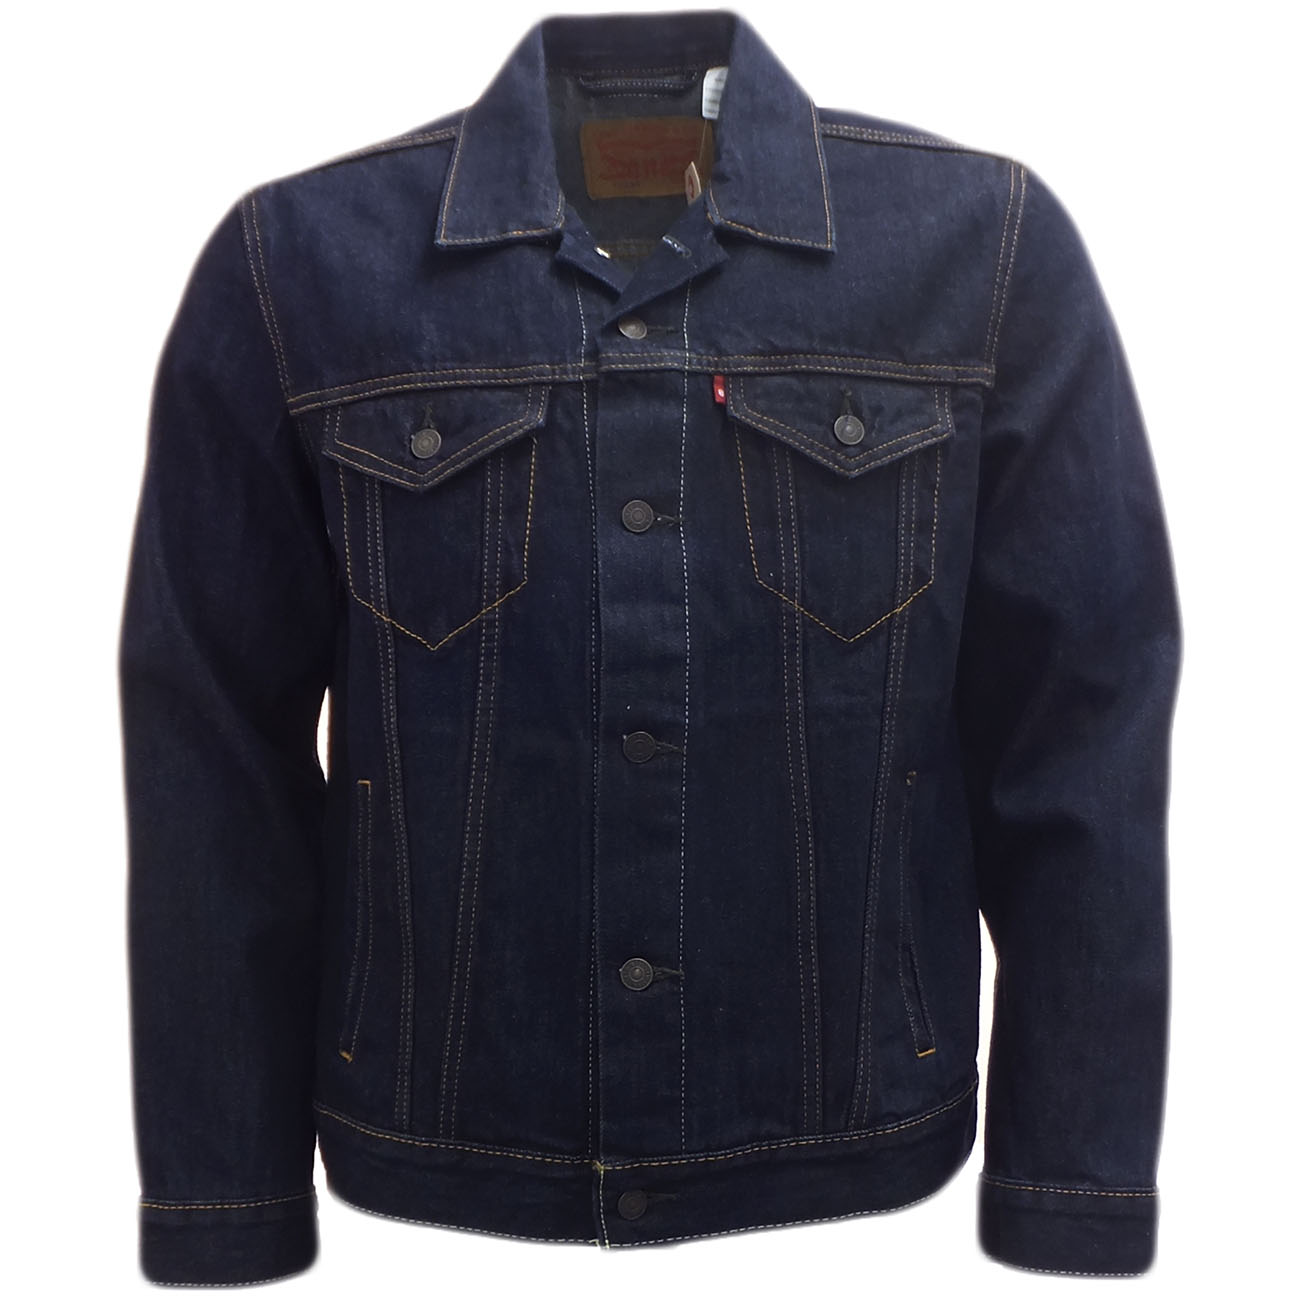 Mens Jean Jacket Levi Strauss Denim Coat Dark Indigo Blue Indigo Ebay